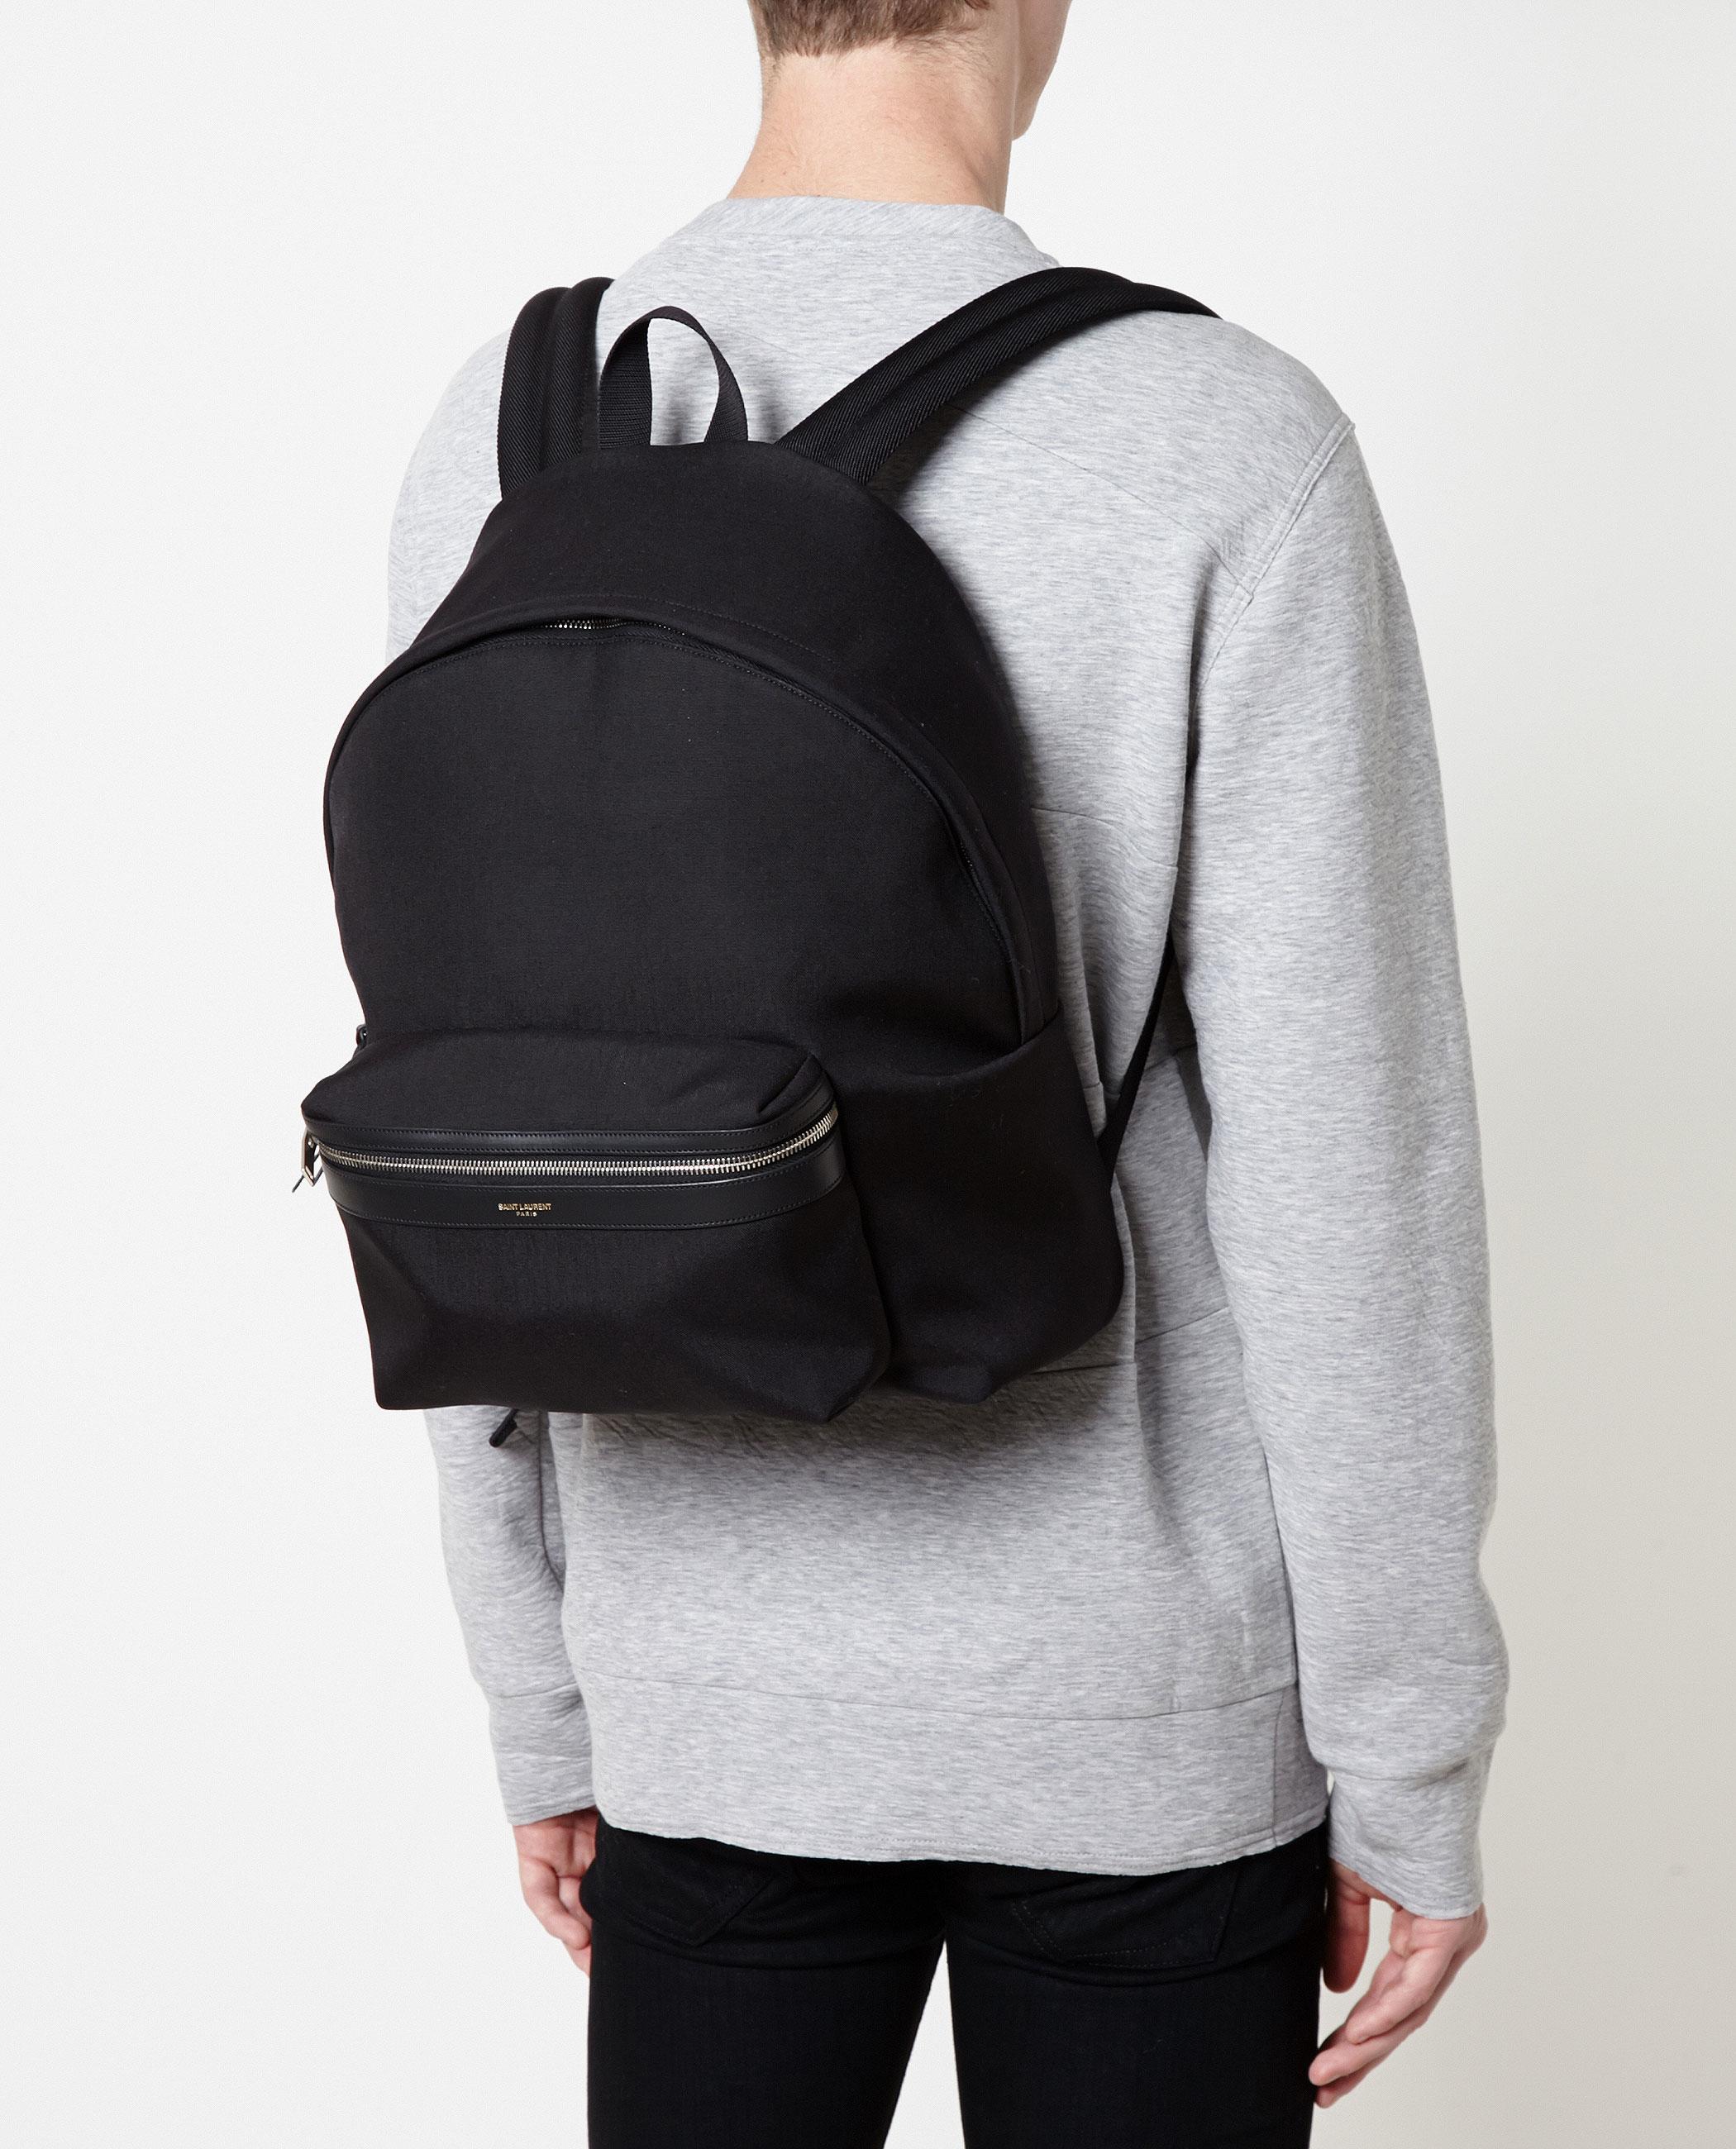 d042514fa Saint Laurent Classic Canvas Backpack in Black for Men - Lyst